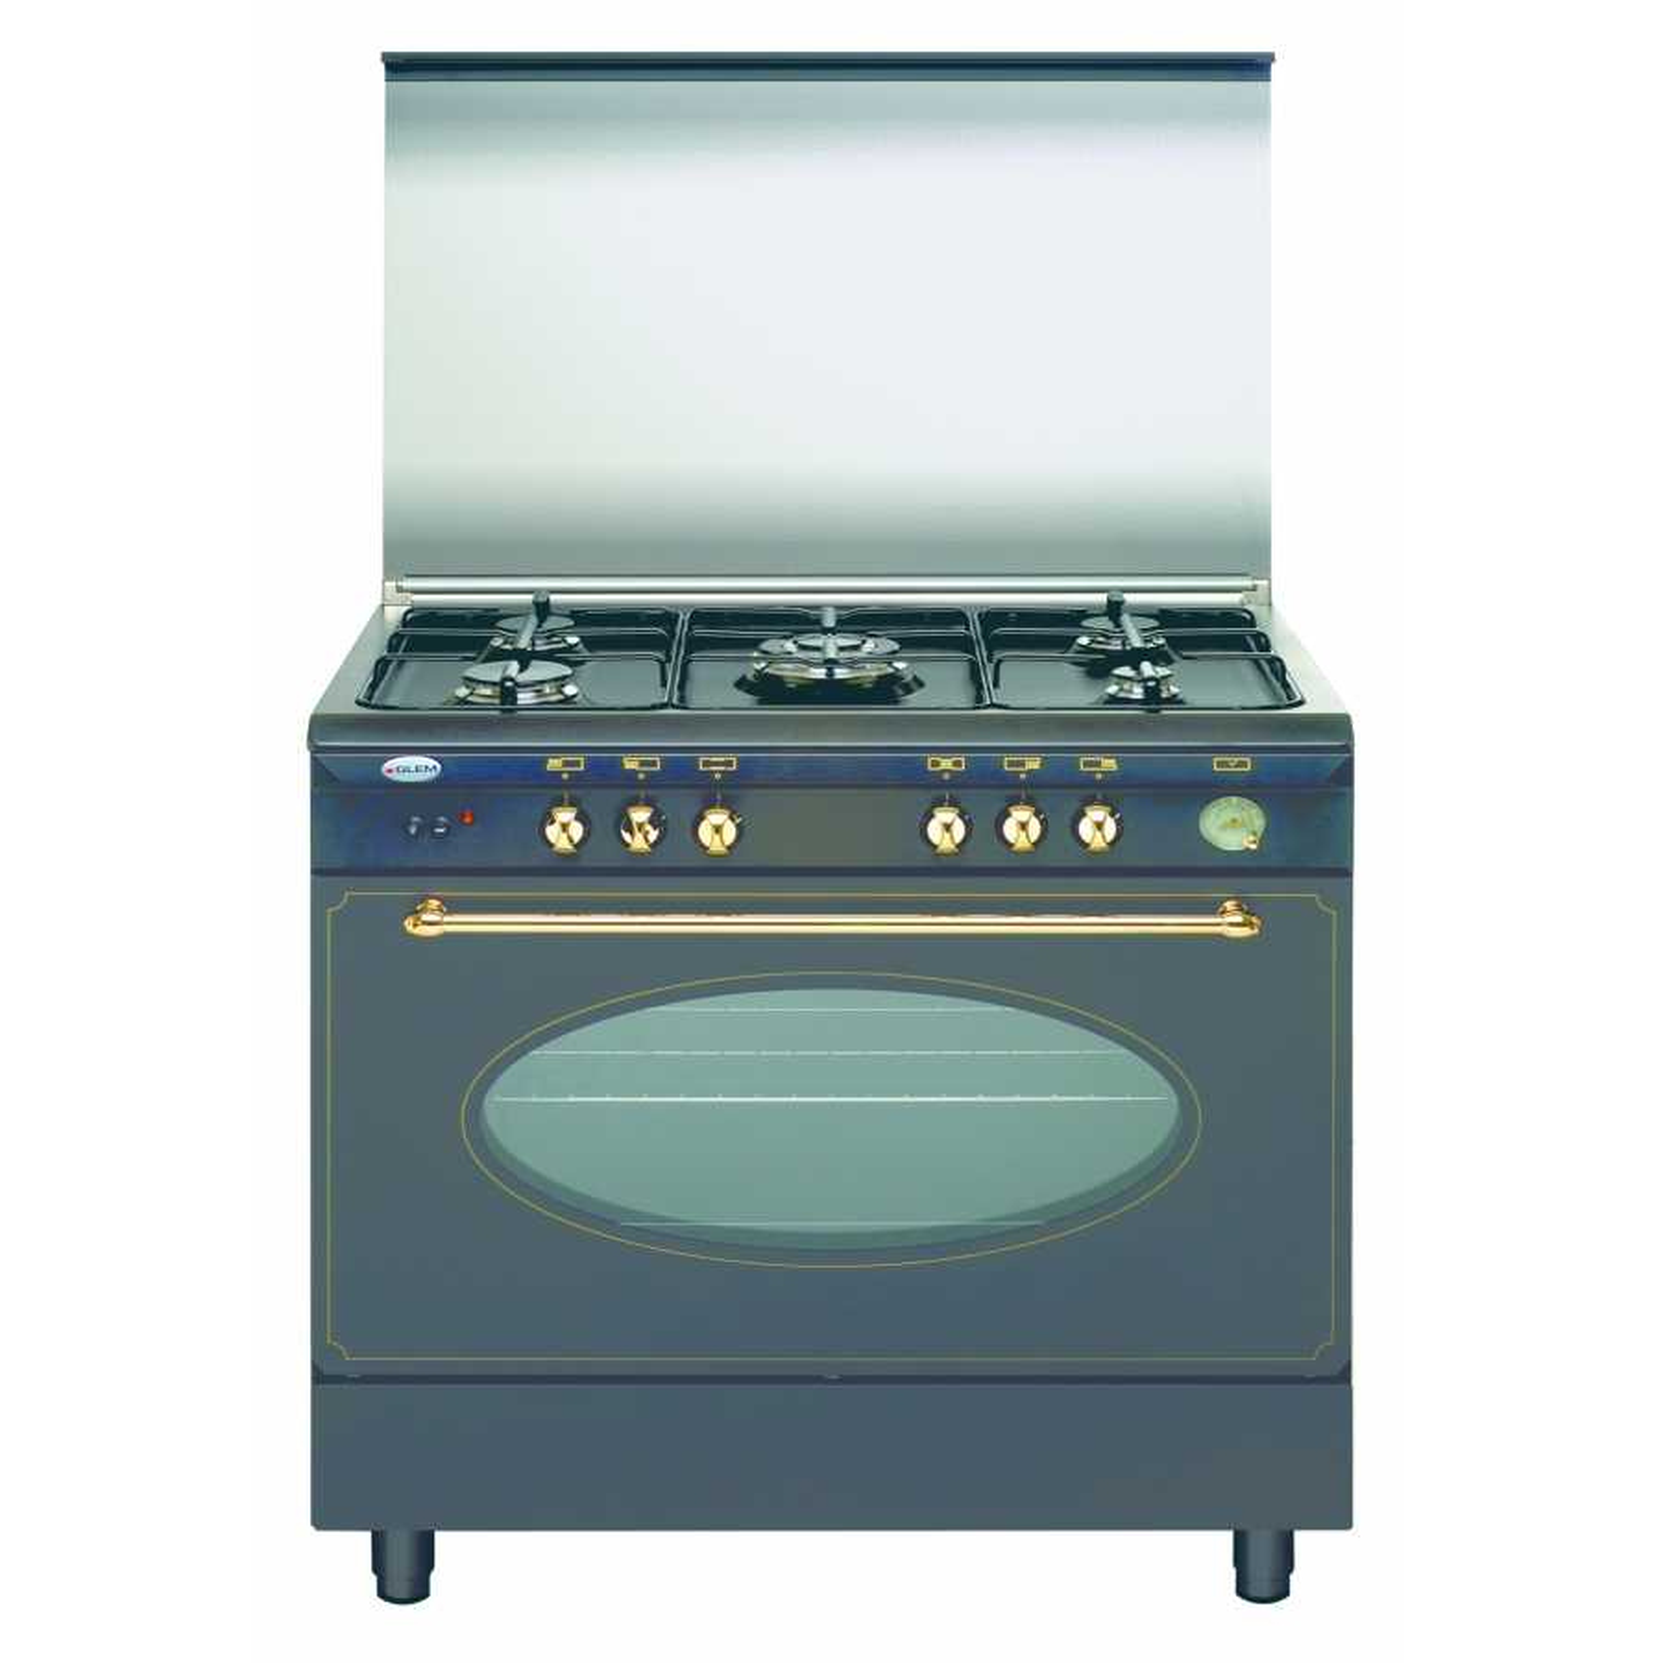 Glem gas unica ua96tr2 cucina a gas 5 fuochi 90x60 forno a gas nero garanzia italia elettrovillage - Cucine a gas samsung ...